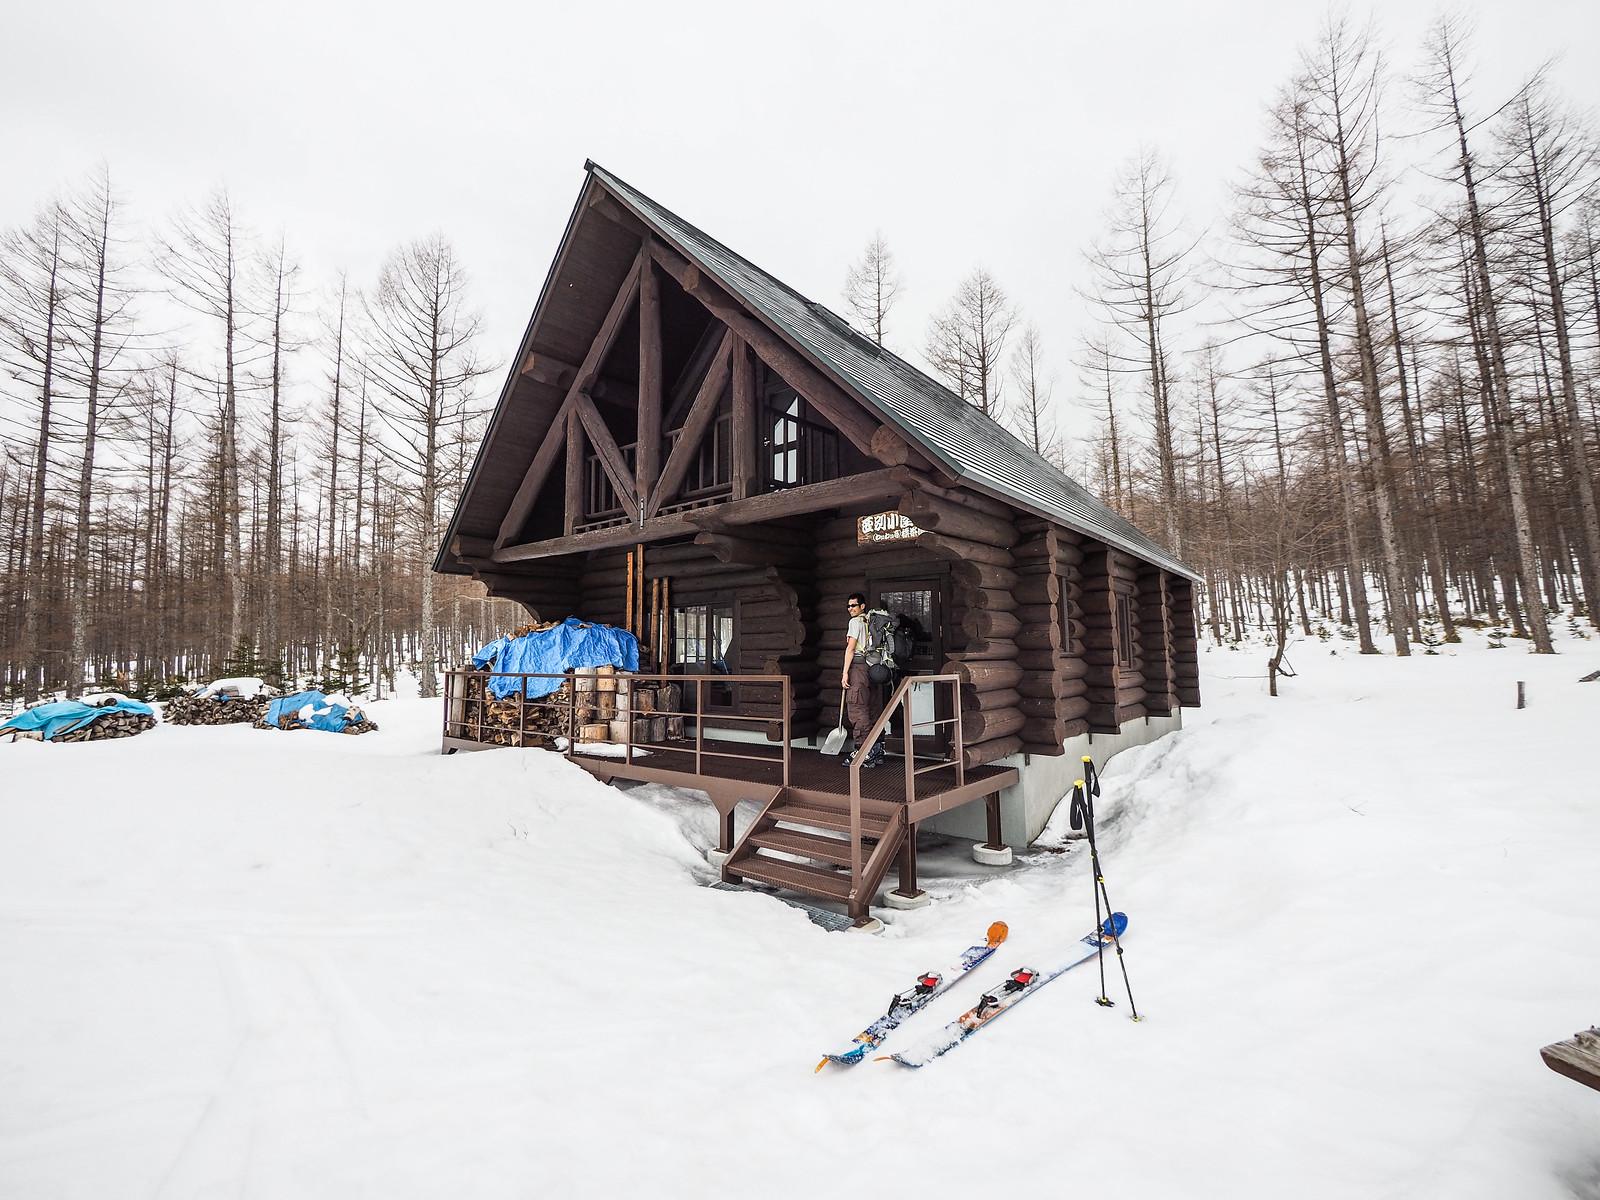 Mt. Nishibetsu Hut ski touring (Eastern Hokkaido, Japan)